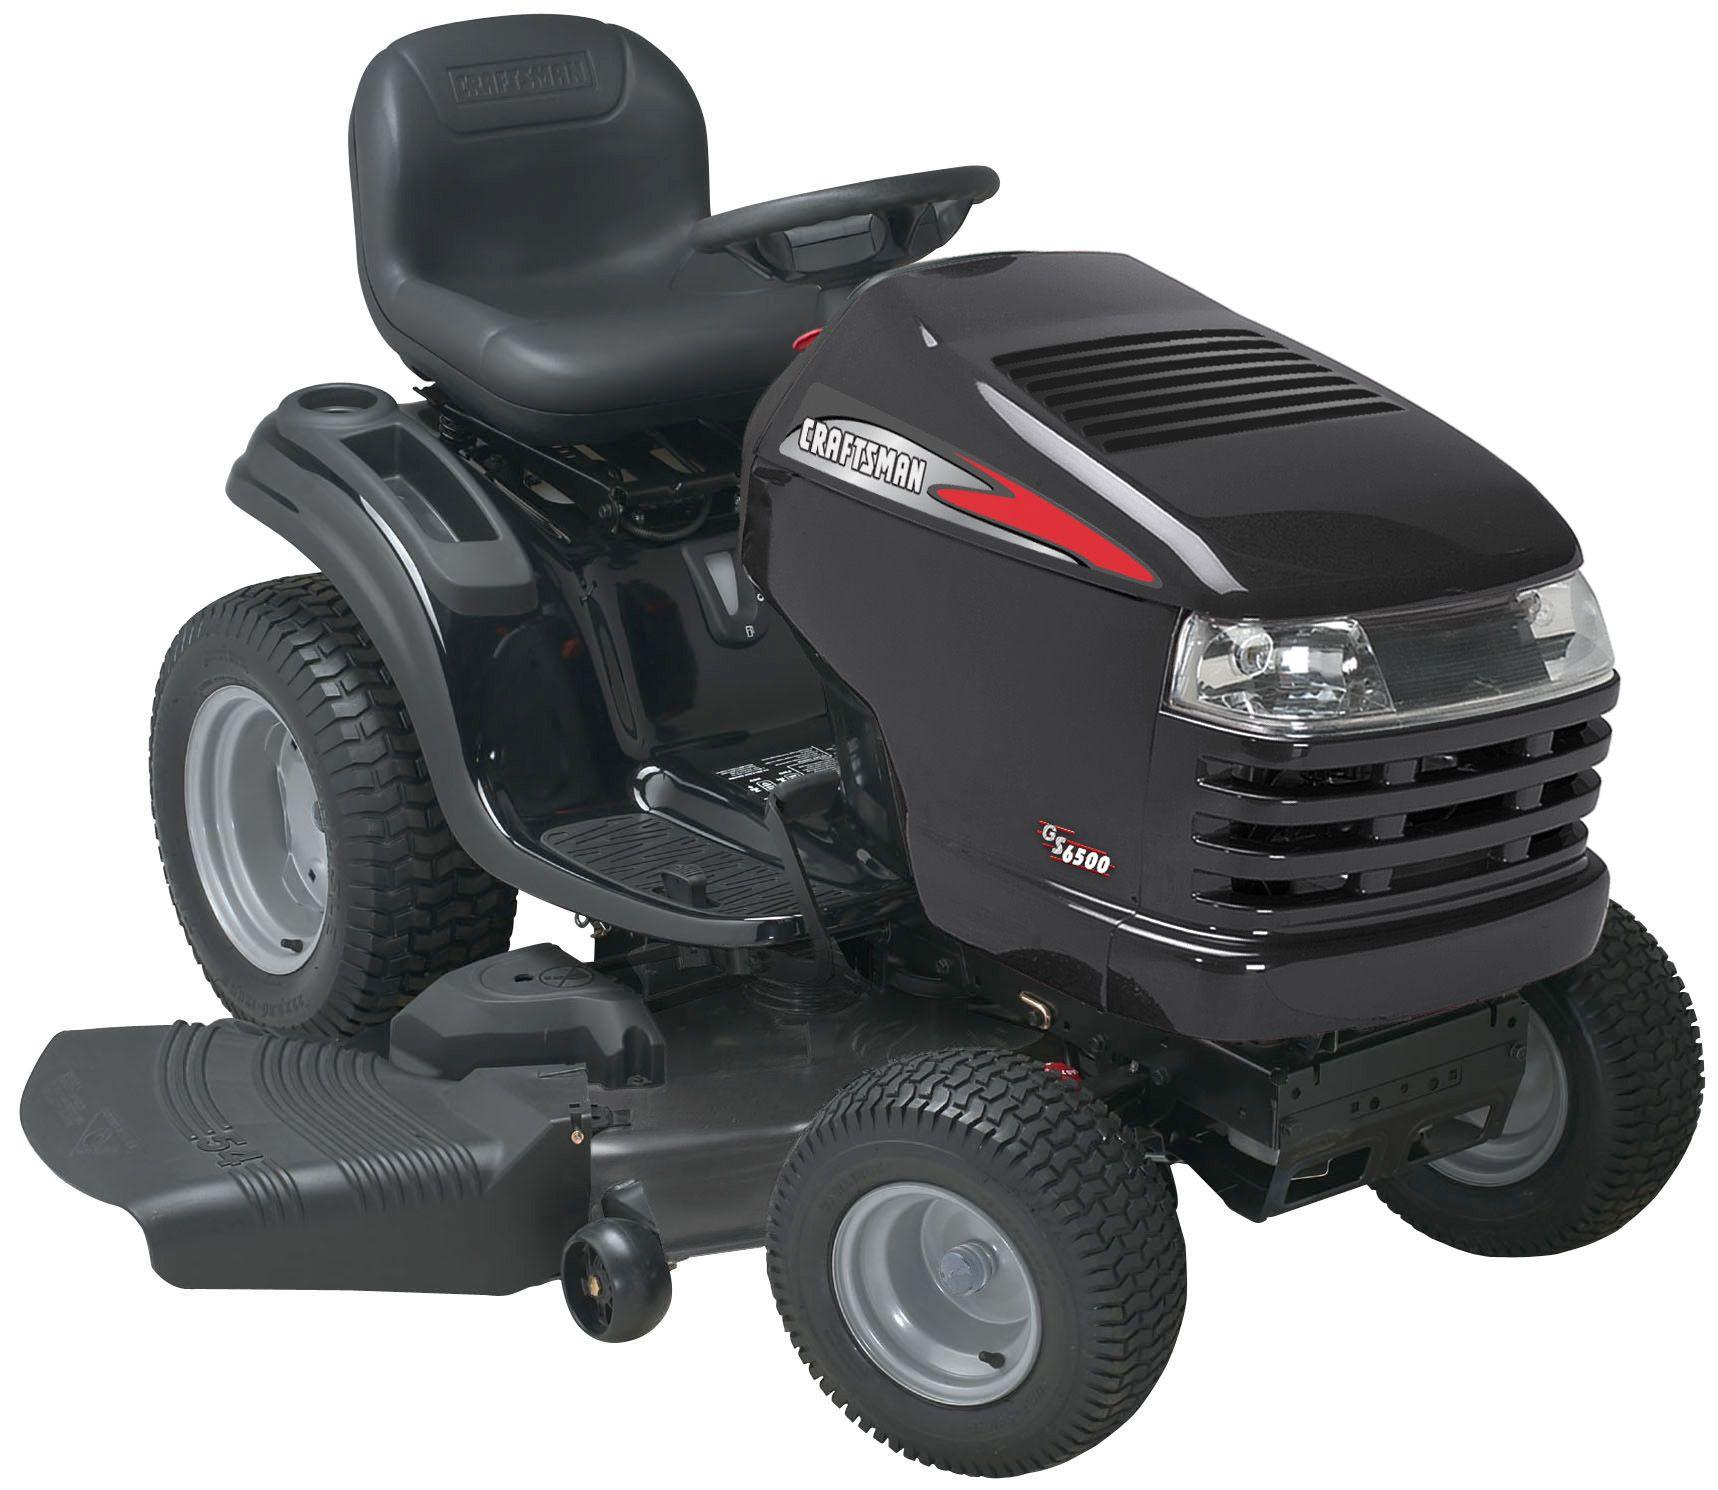 Craftsman 26 Hp 54 In. Deck Garden Tractor - Lawn & Riding Mowers Tractors